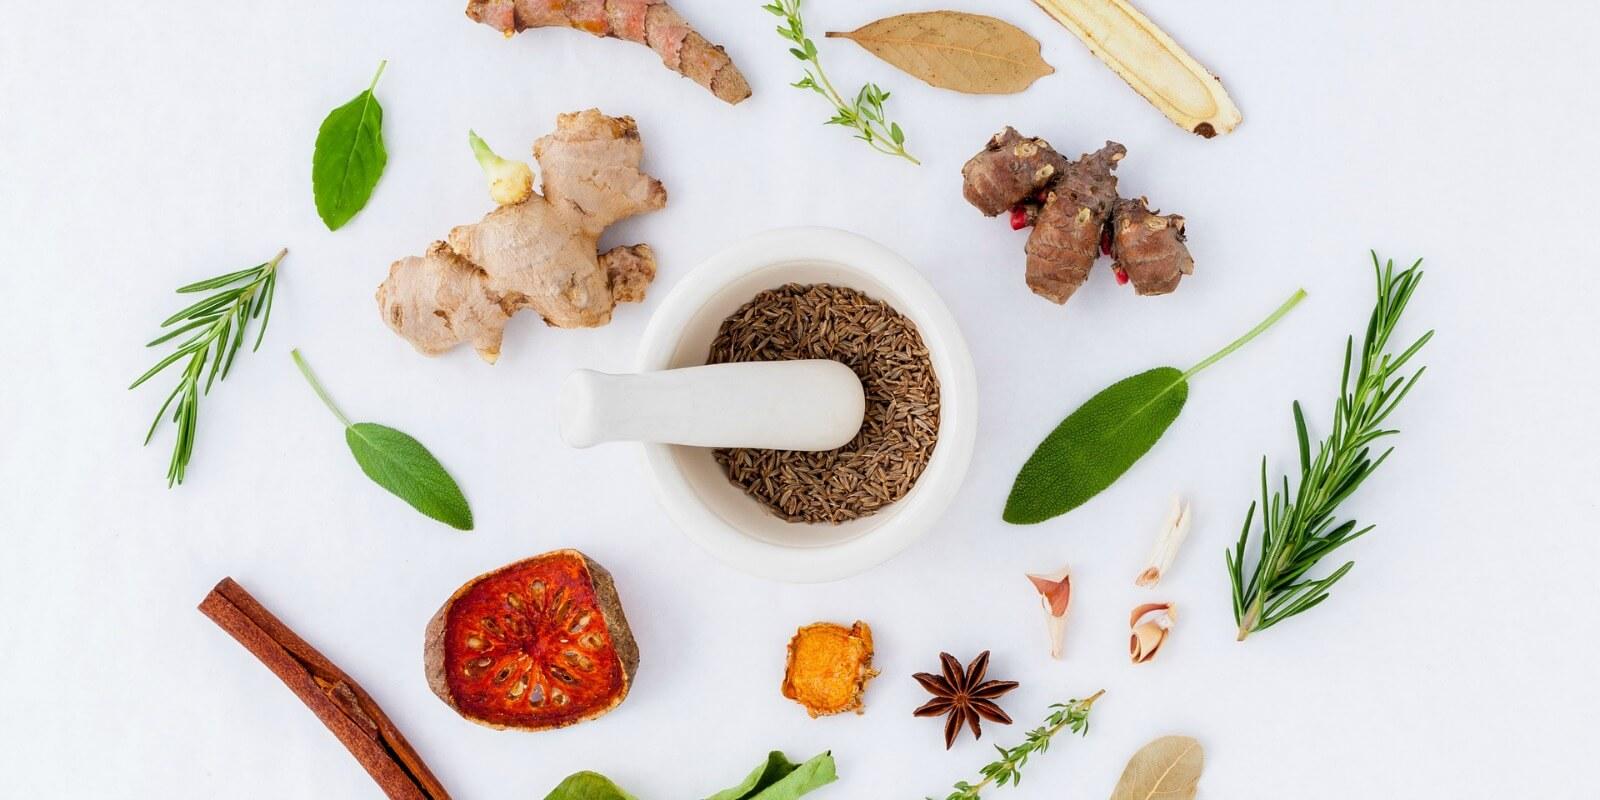 Healing Disease with food